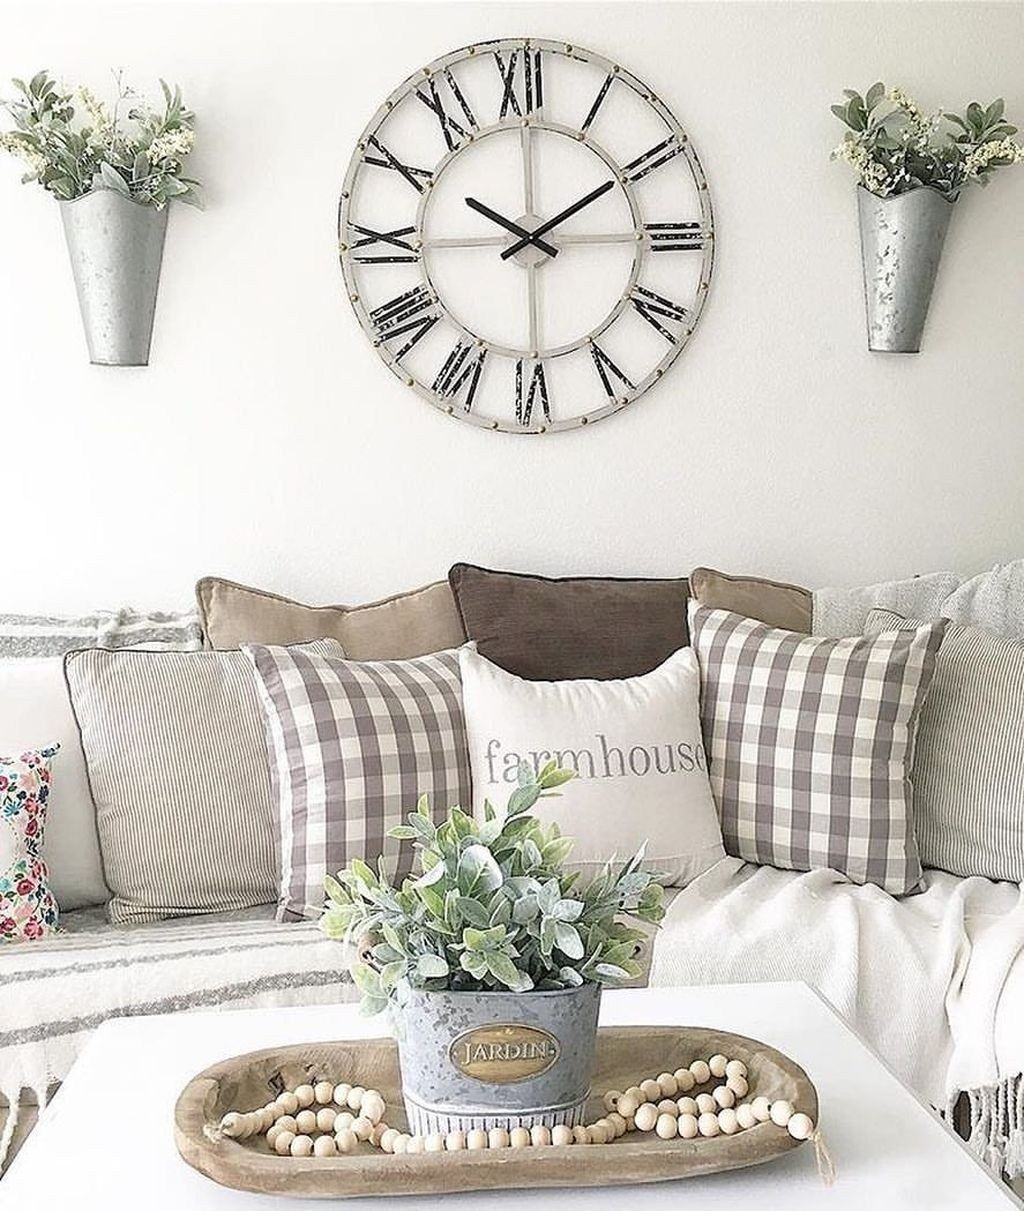 40 Unique Wall Decor Ideas With Clocks In 2020 Living Decor Kirkland Home Decor Home Decor